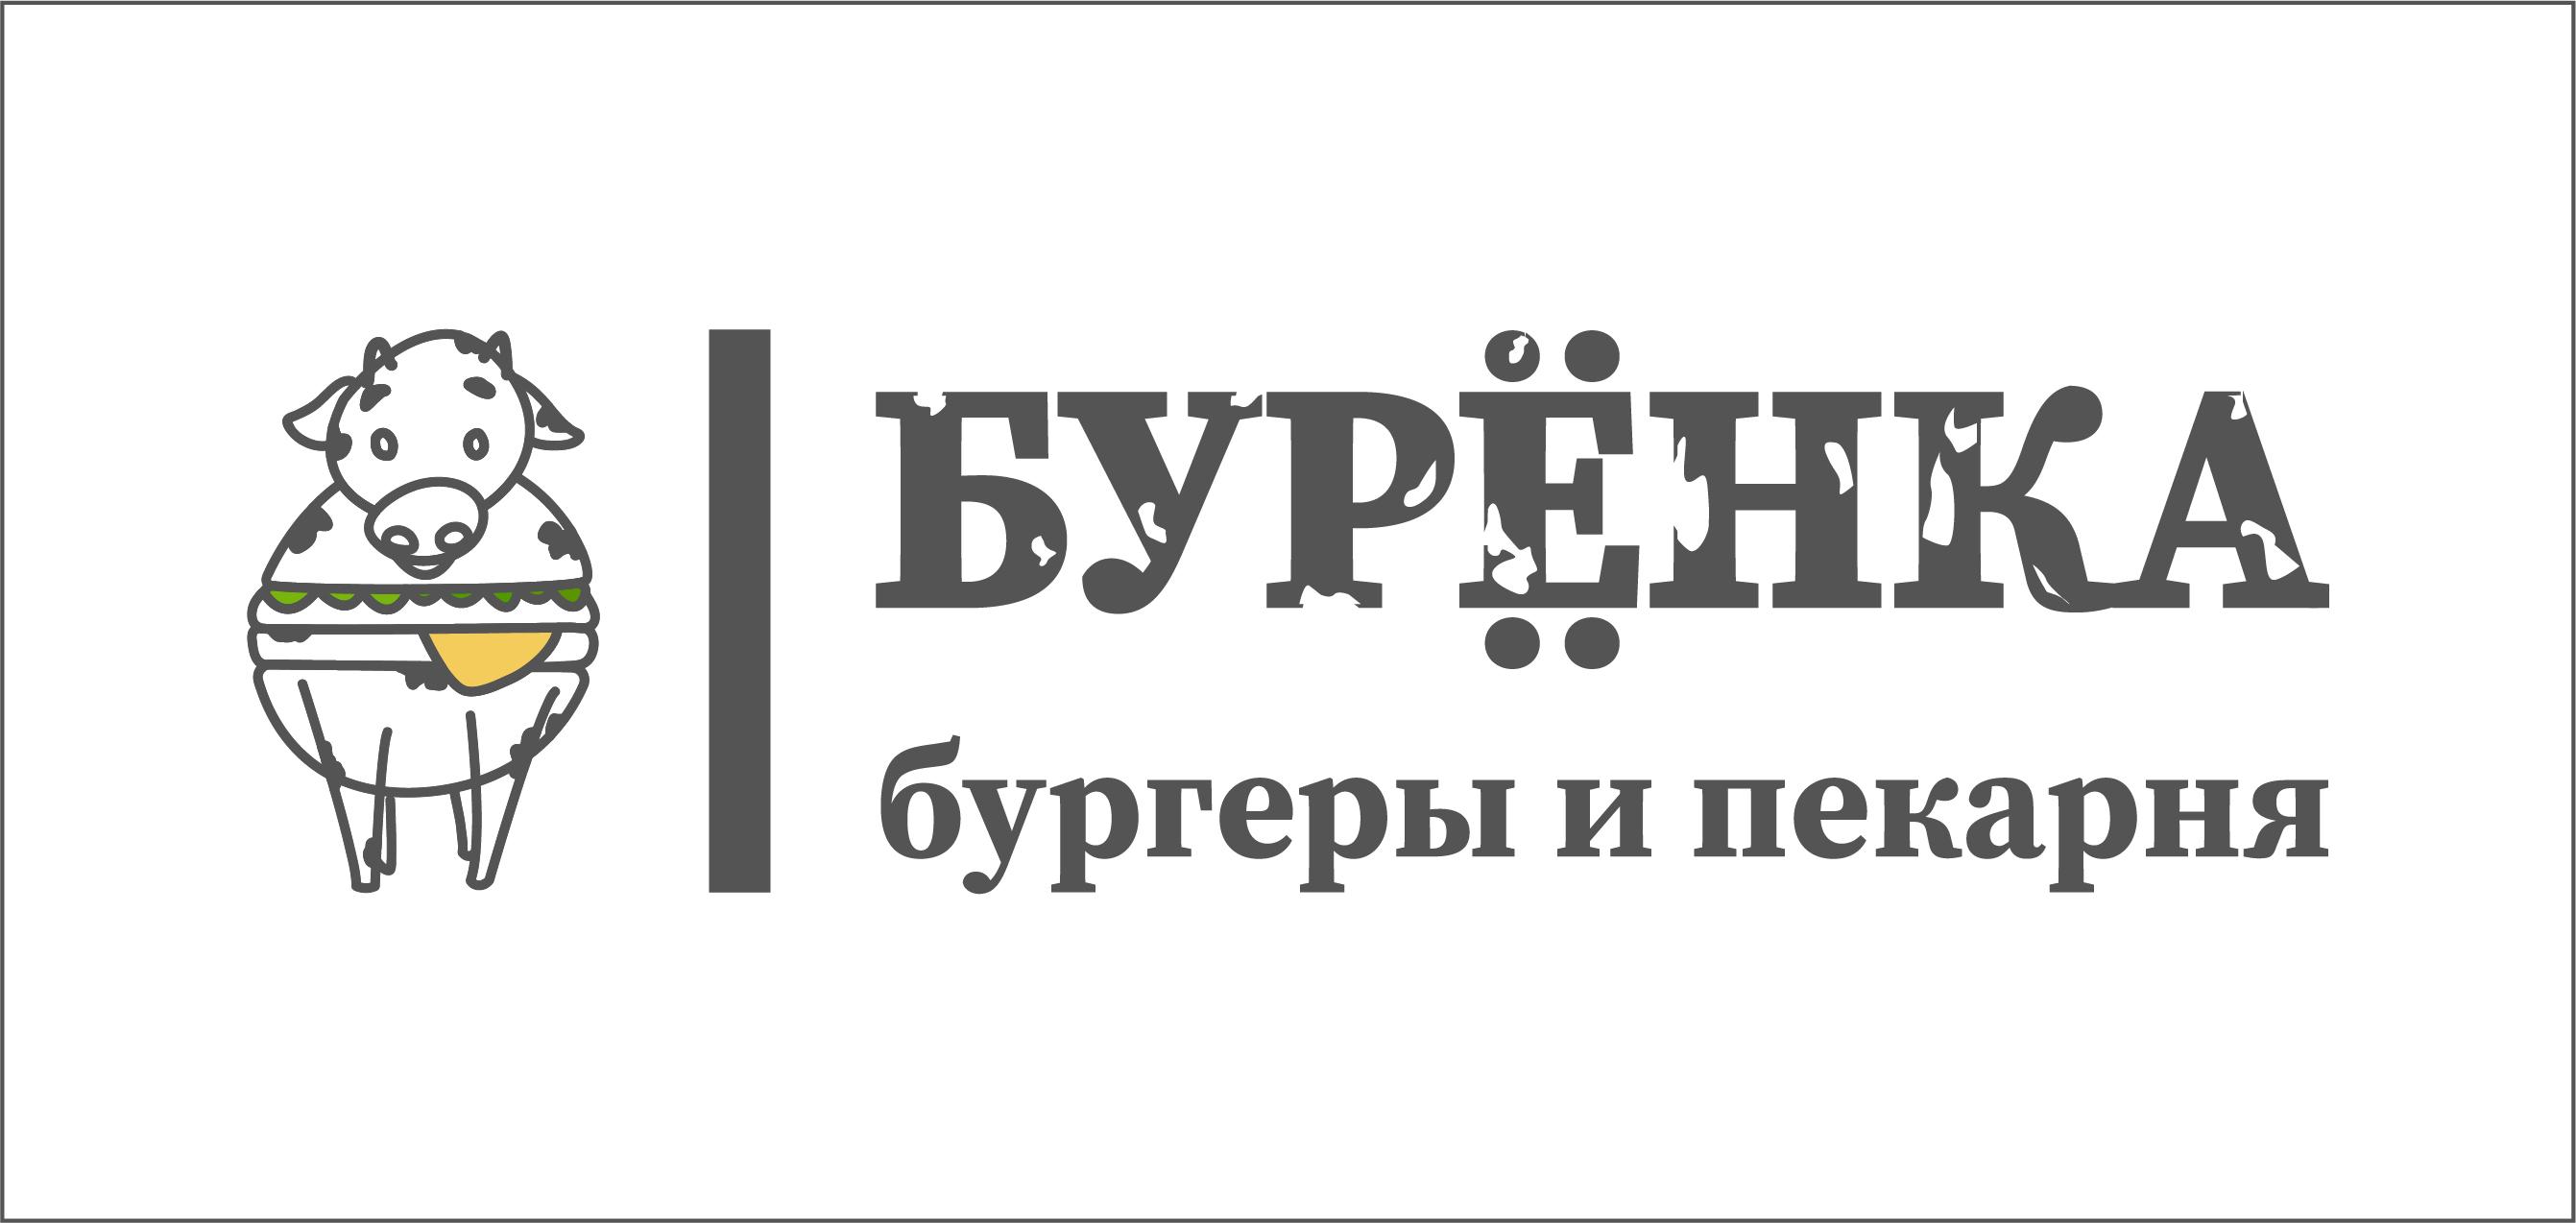 Логотип для Бургерной с Пекарней фото f_0575e136251e0240.jpg